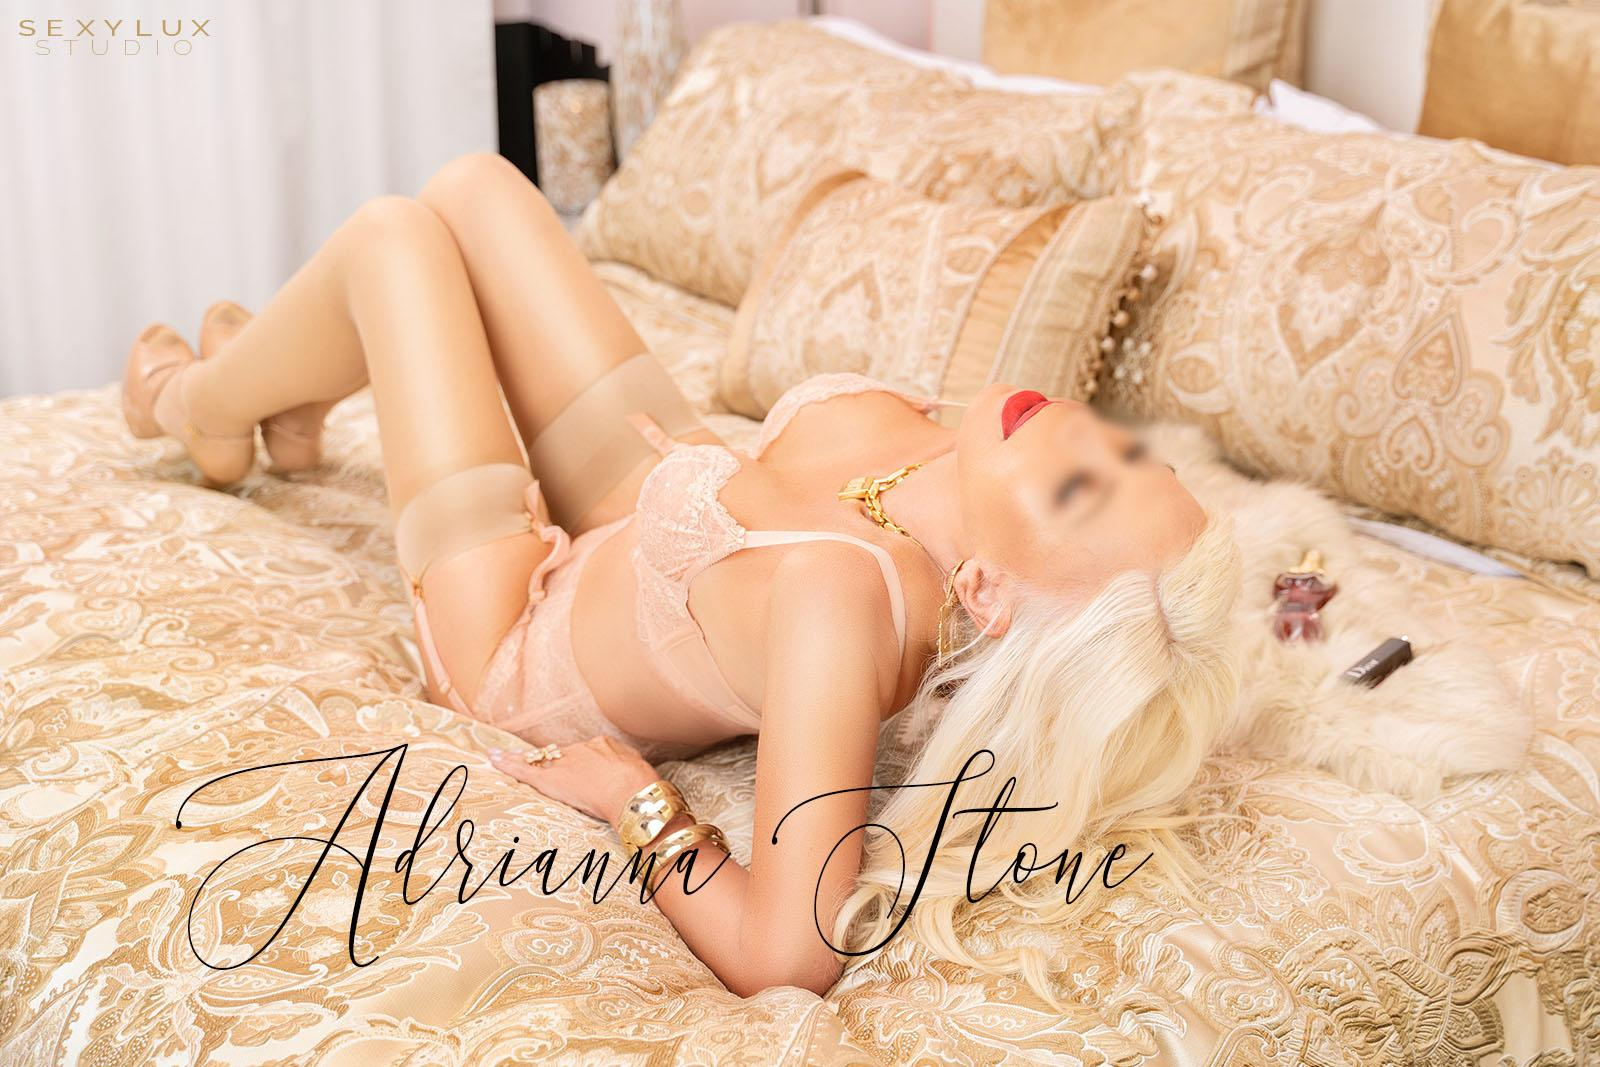 Sexy blonde Latina Miami escort in black lingerie